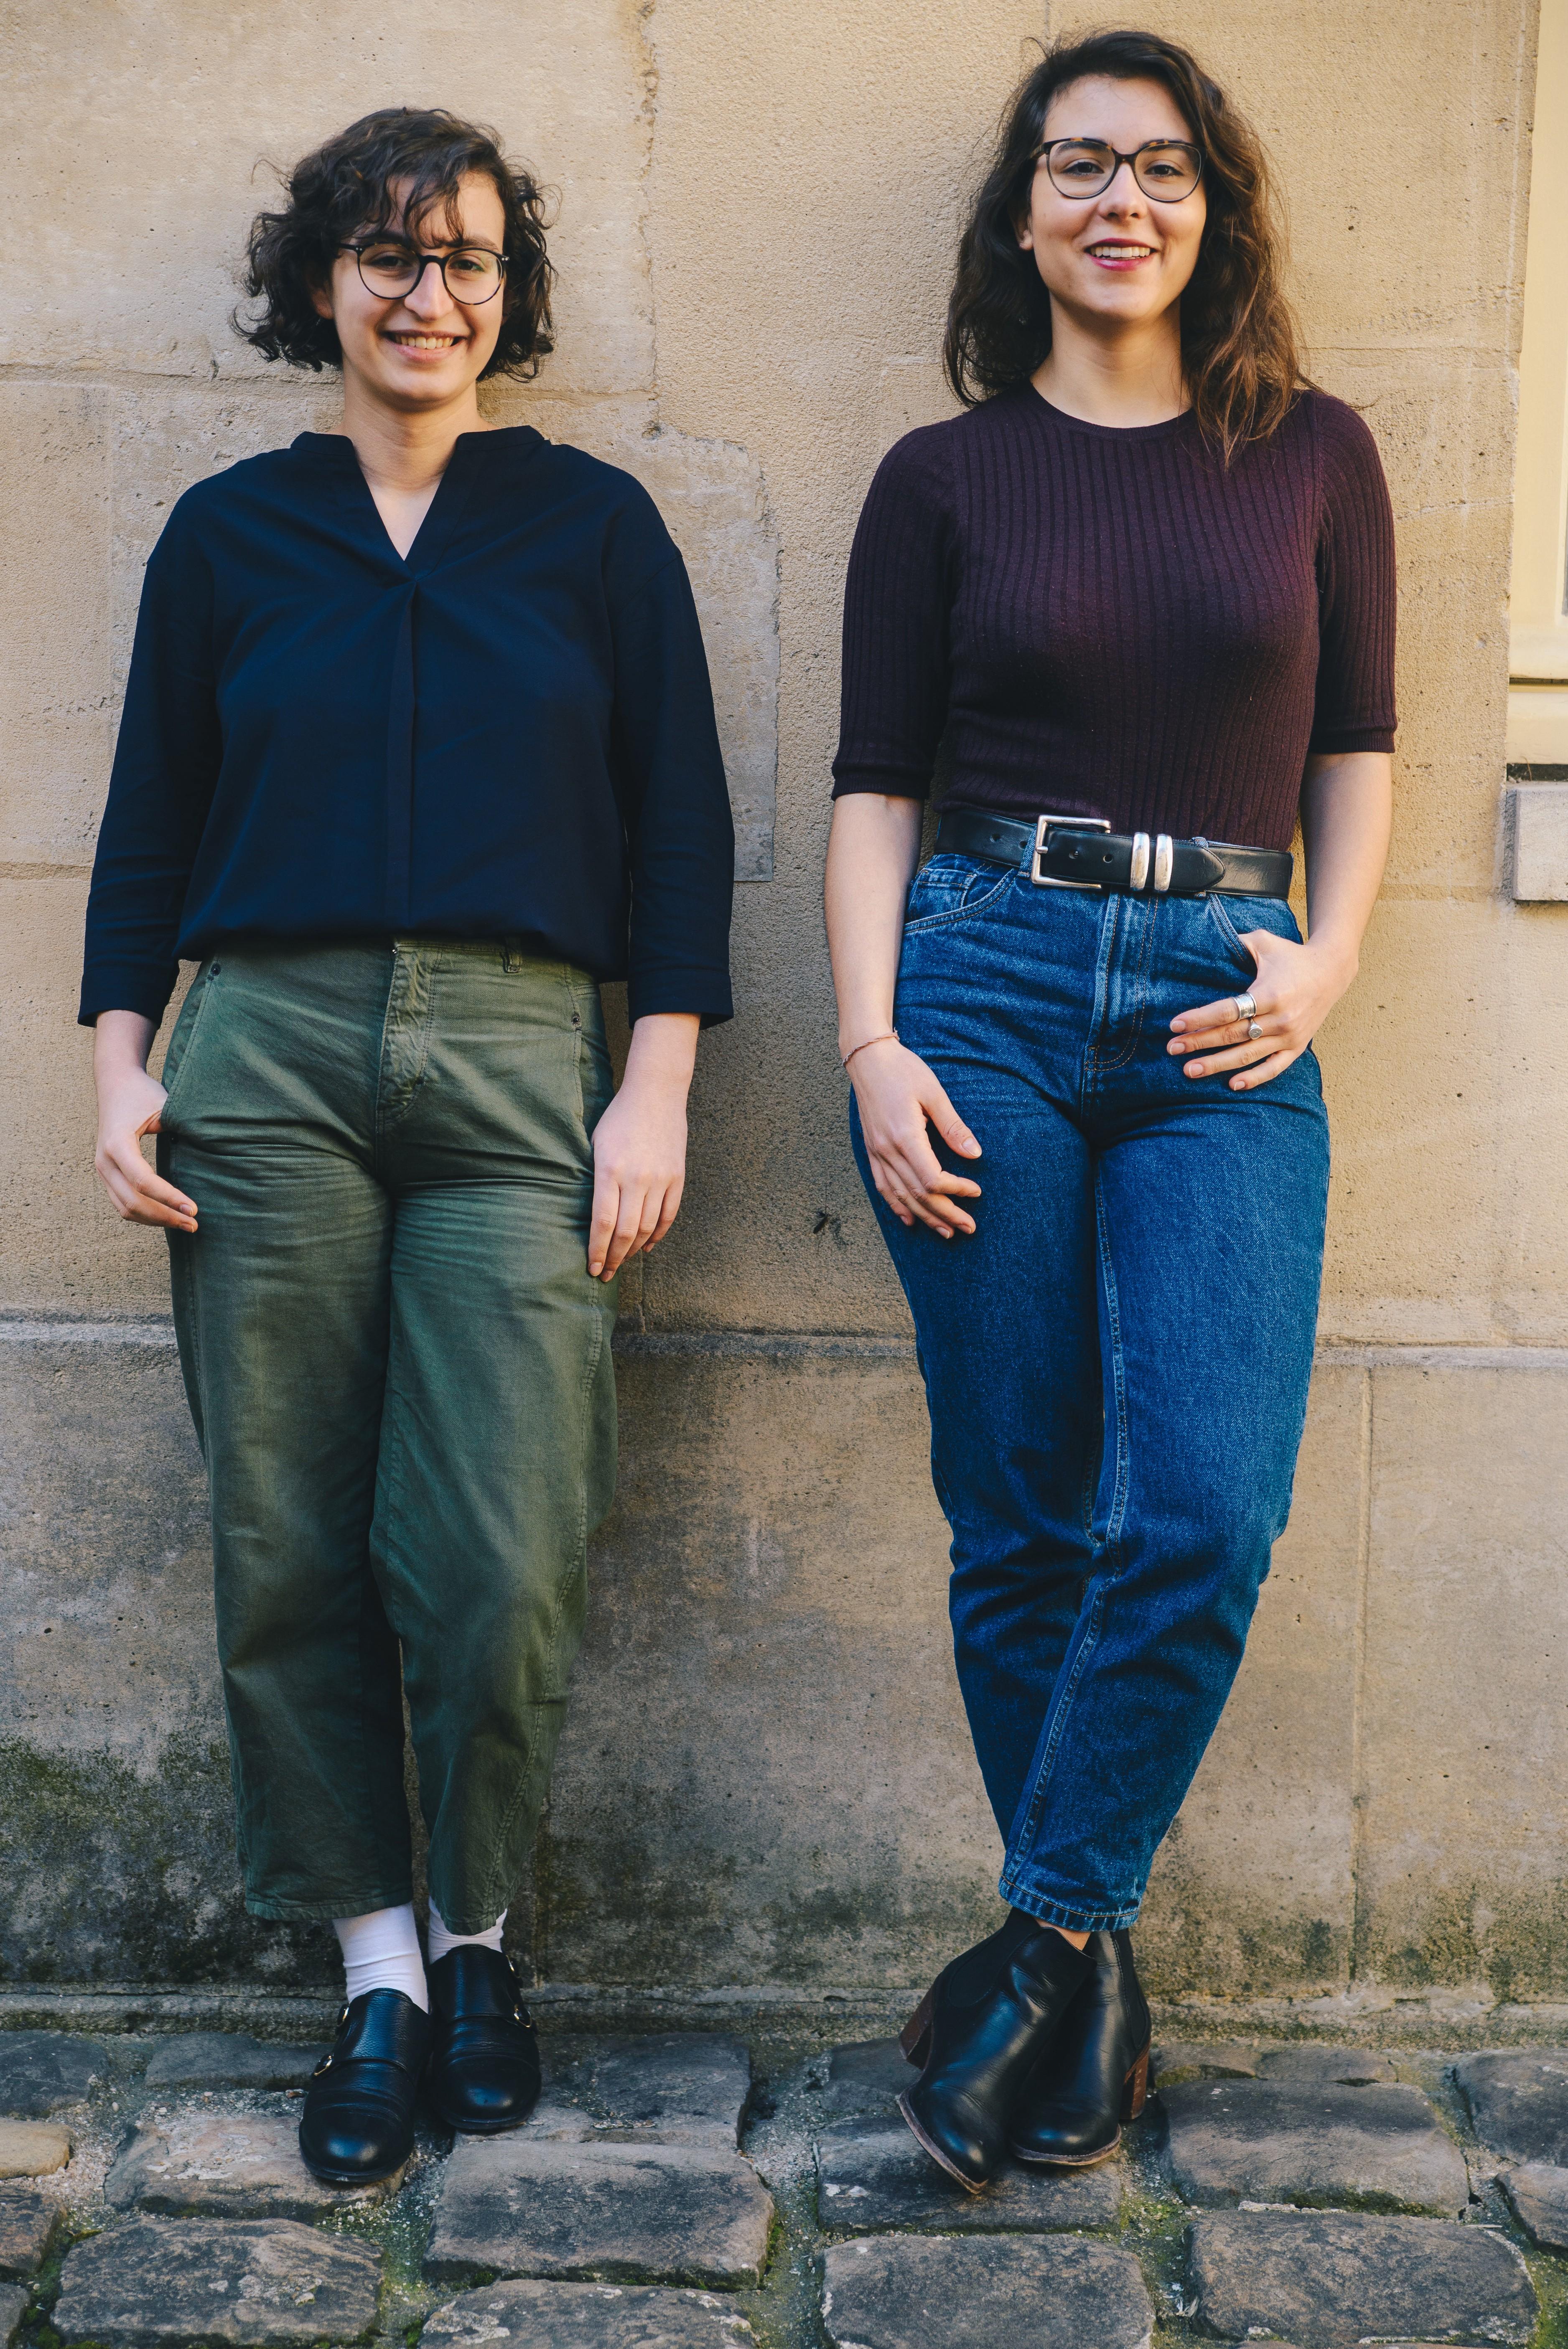 Marine Depery et Louise Geday-Volait studio samedi